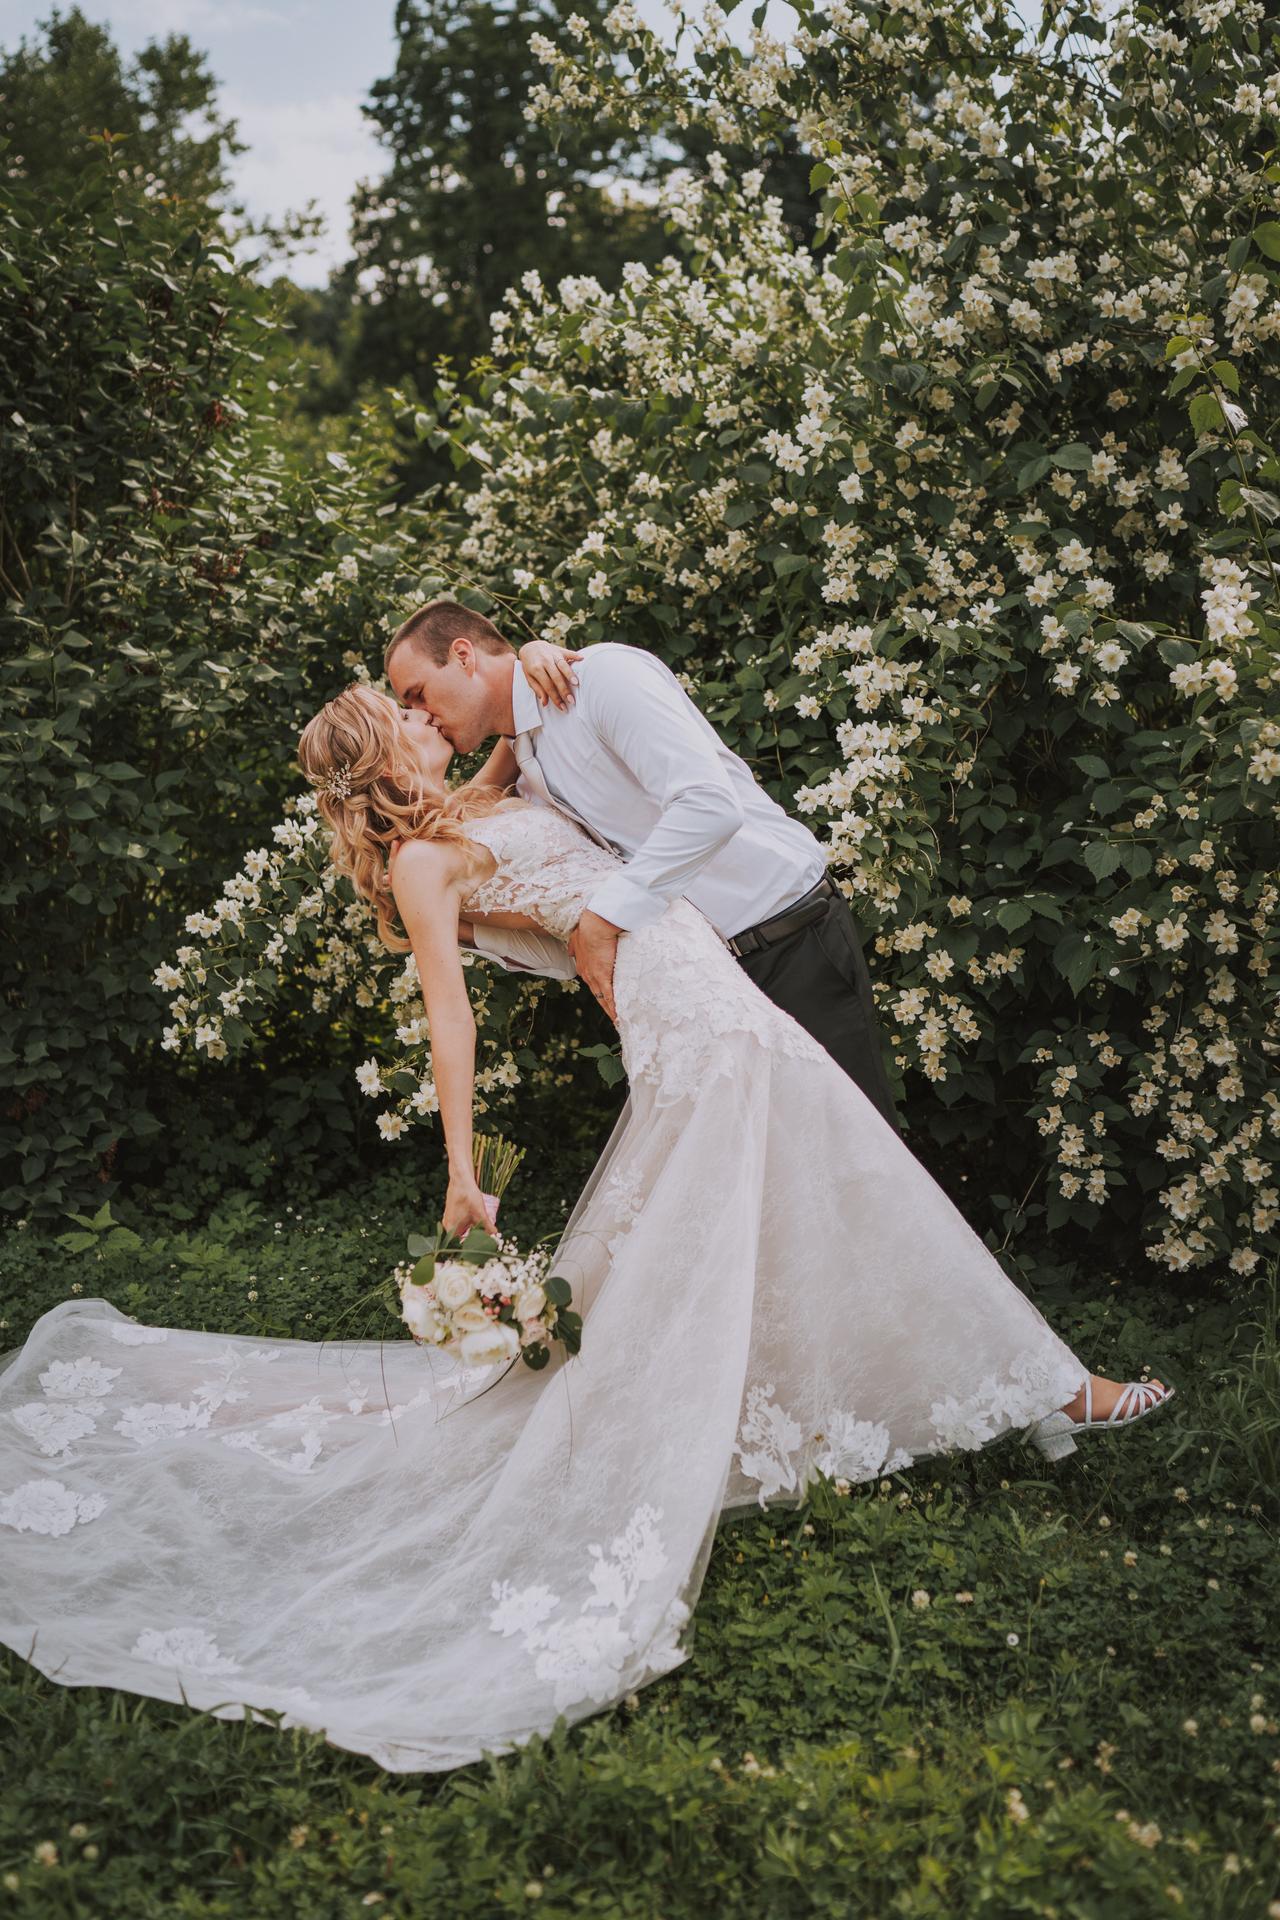 Naše svatba - Obrázek č. 9